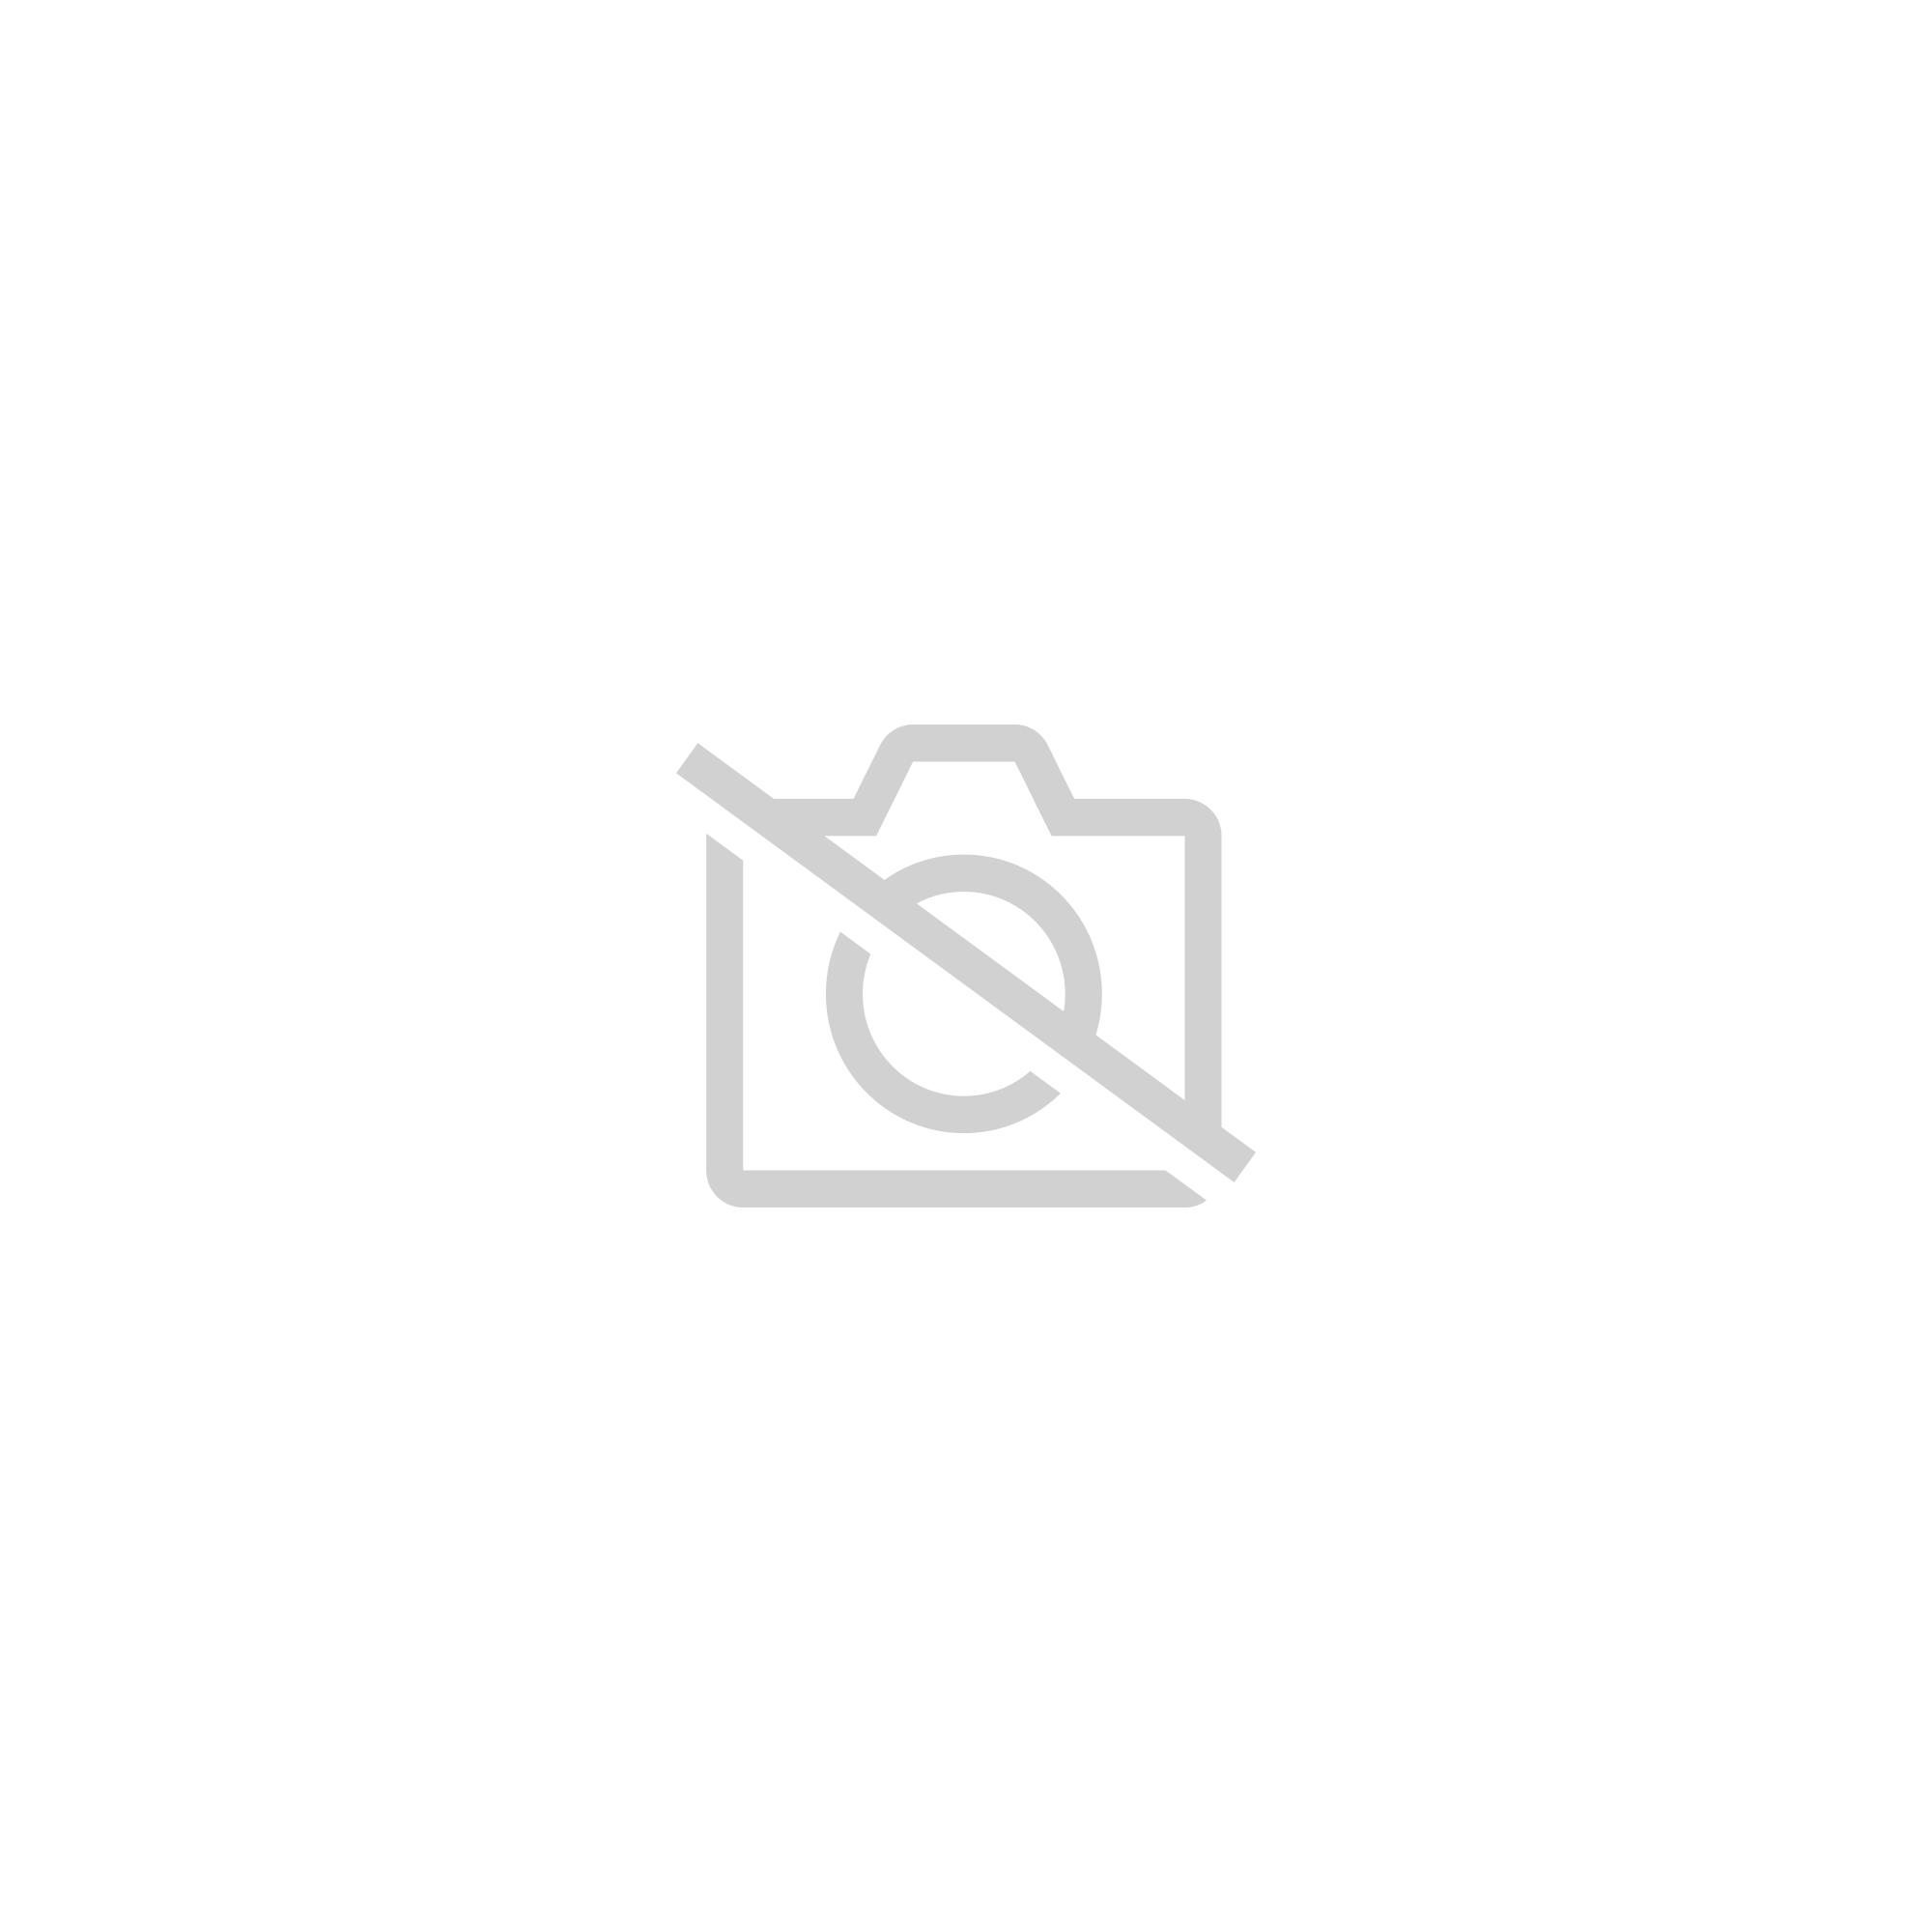 Cr�ation Plush Craft : My Design : Cuddly Cat Pillow